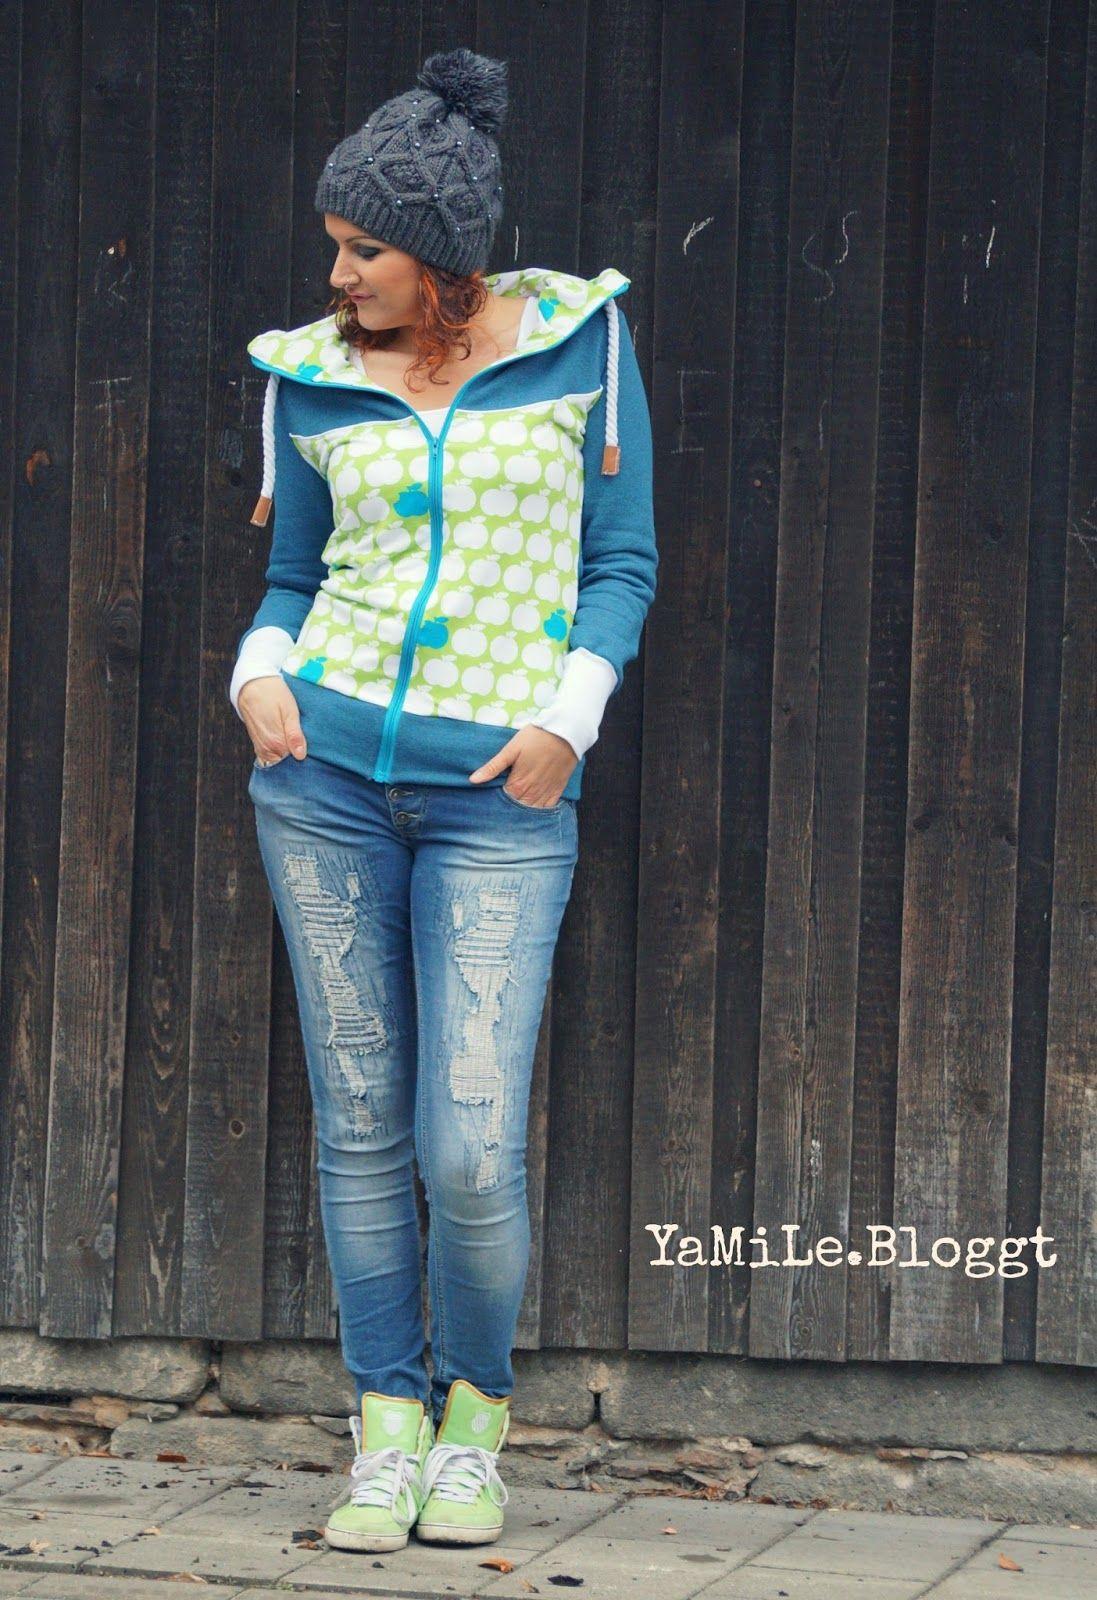 https://yamile-bloggt.blogspot.co.uk/2016/12/apfelsweatjacke.html